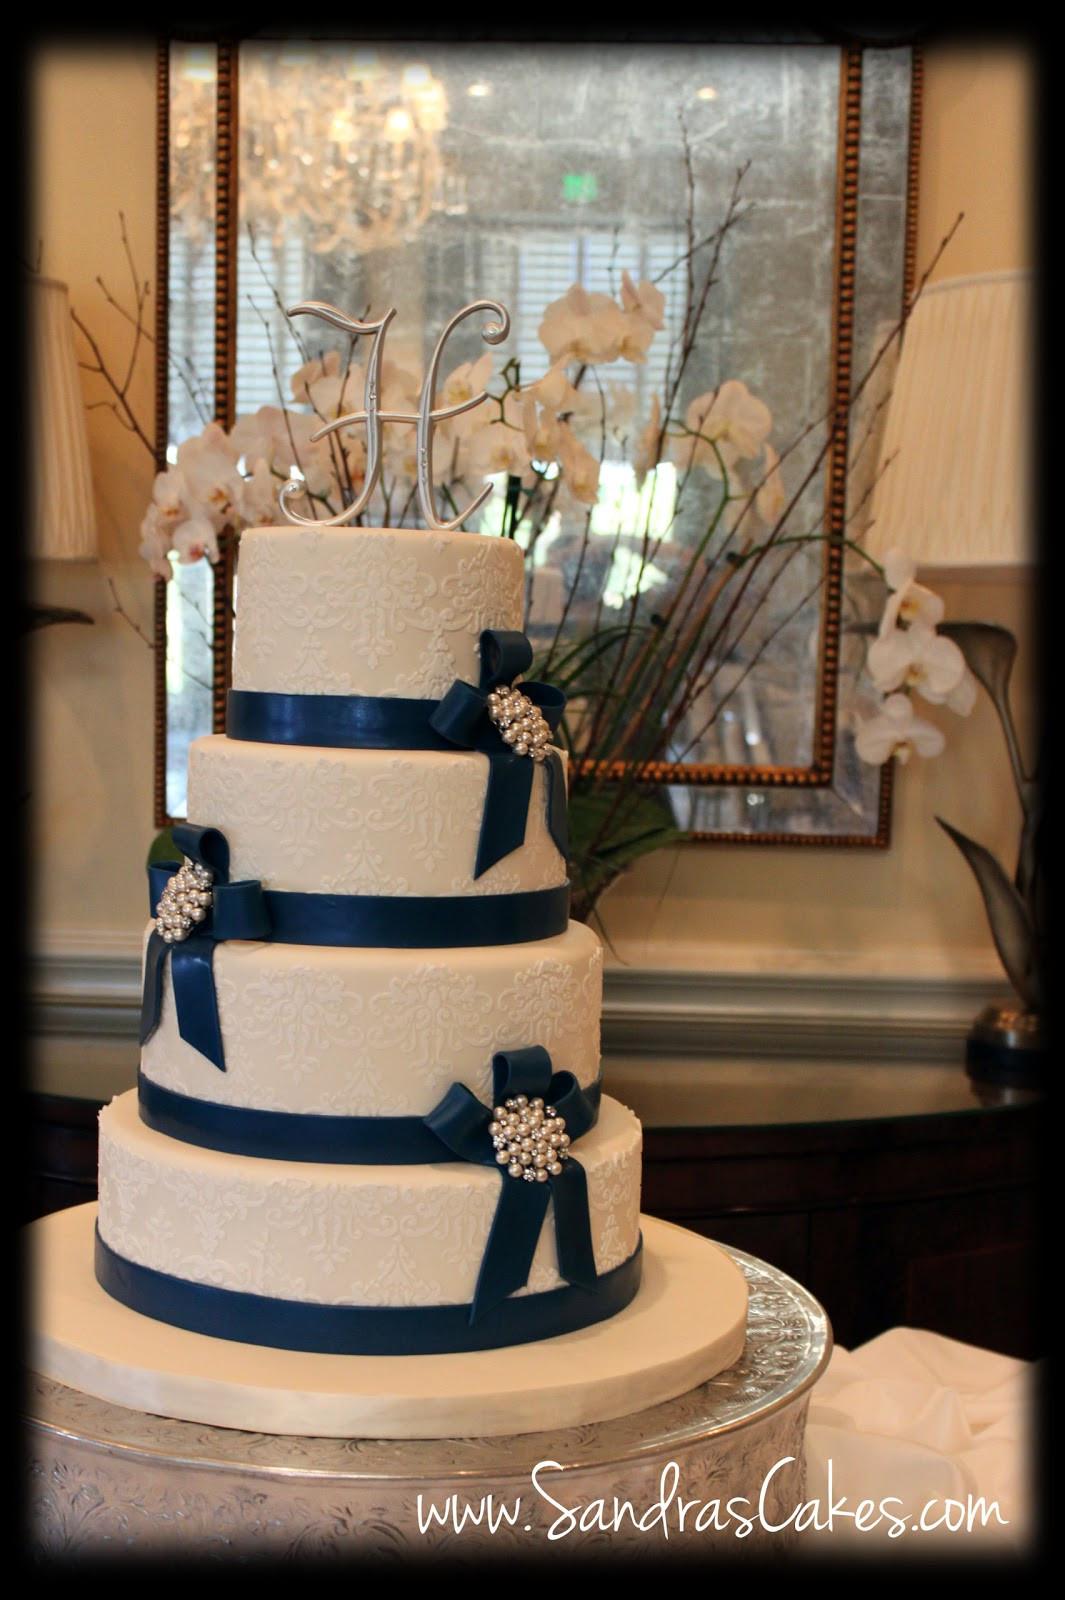 Classy Wedding Cakes  Elegant and Classy Wedding Cake